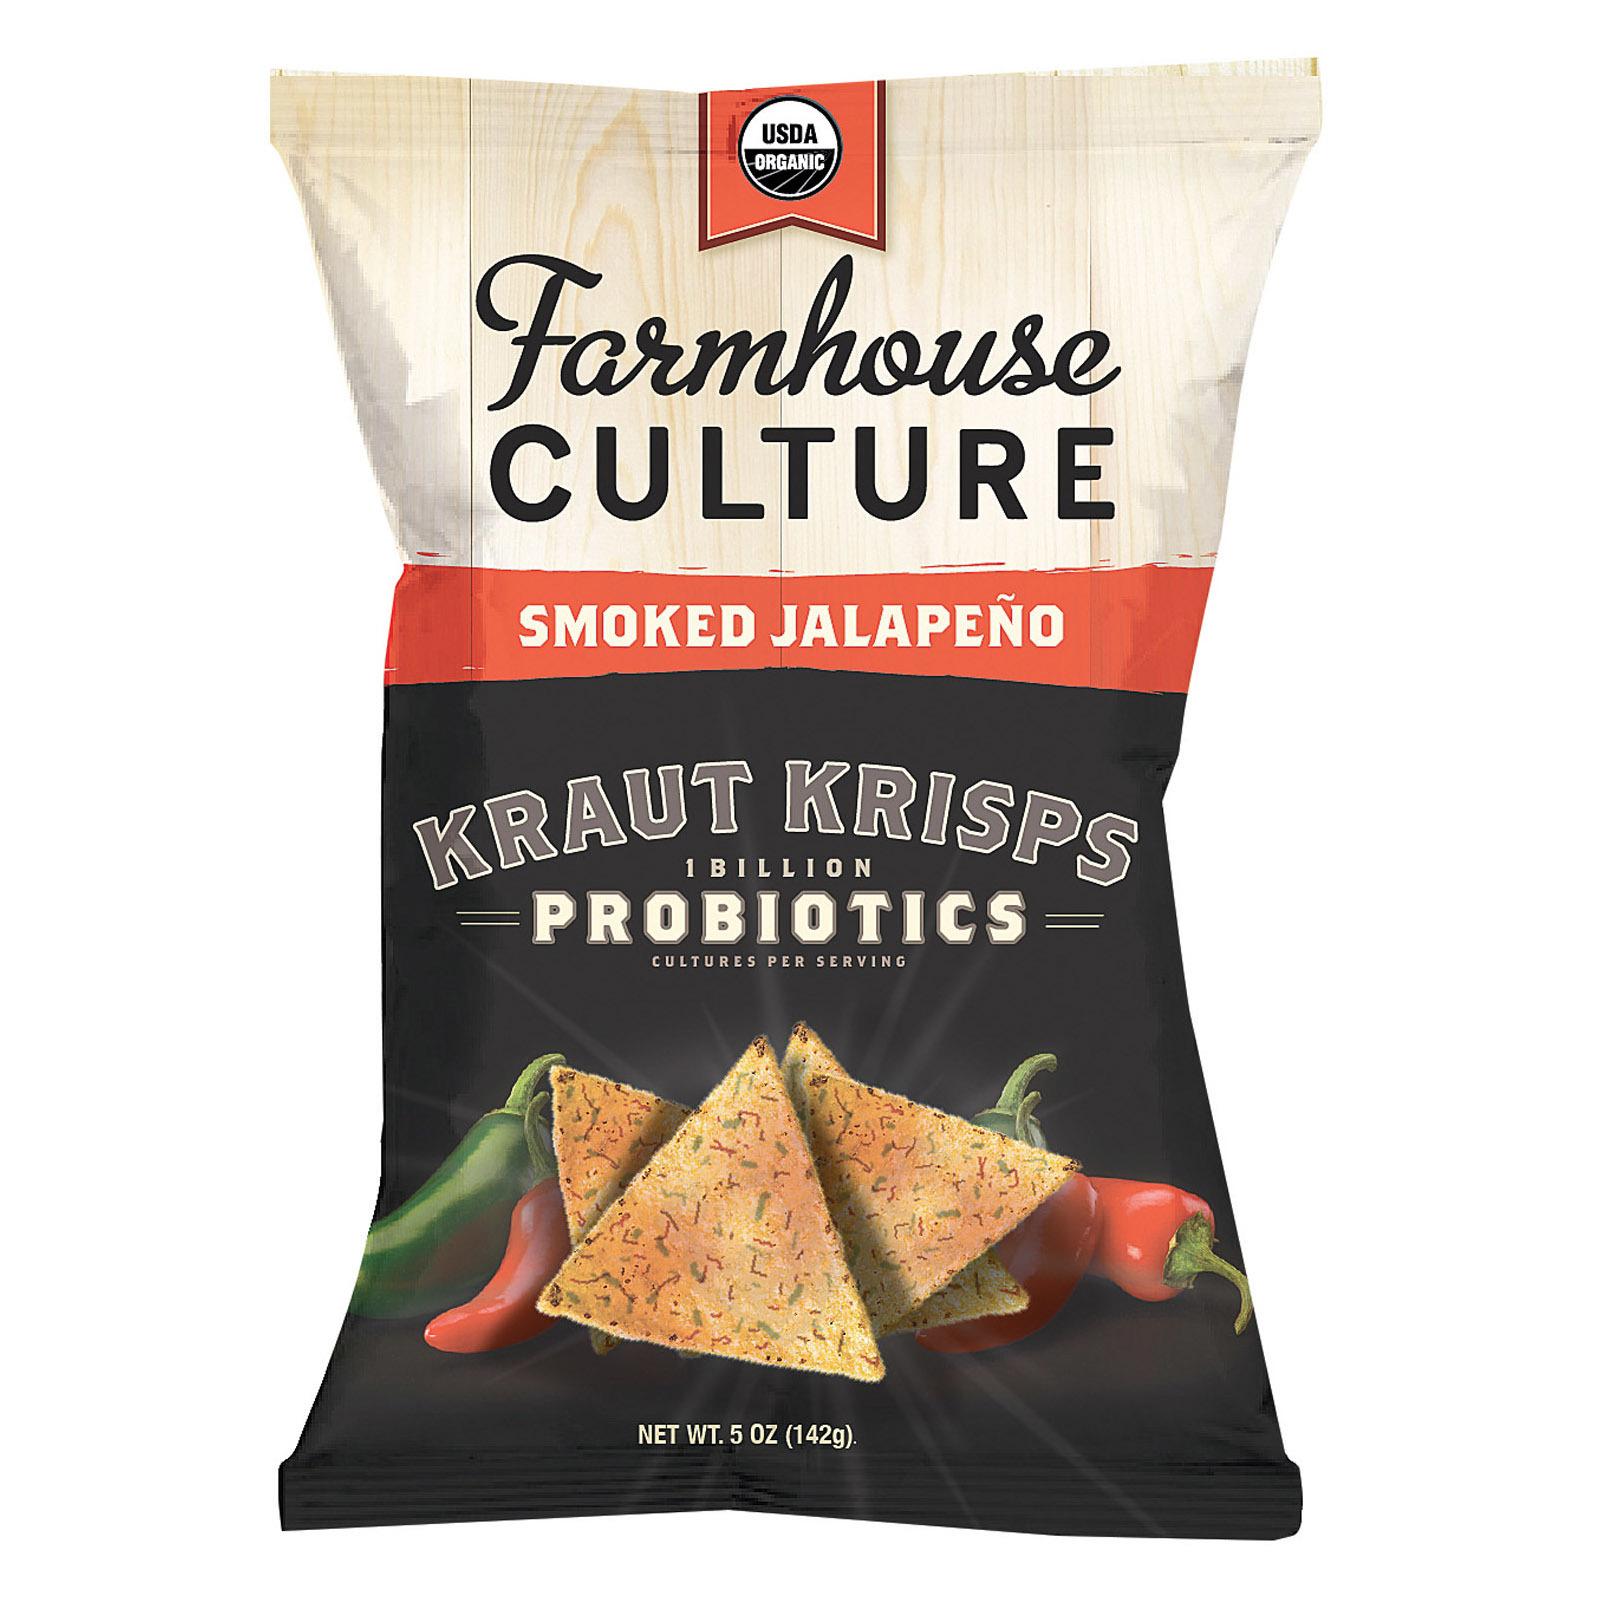 Farmhouse Culture Organic Probiotic Kraut Krisps - Smoked Jalapeno - Case of 12 - 5 oz